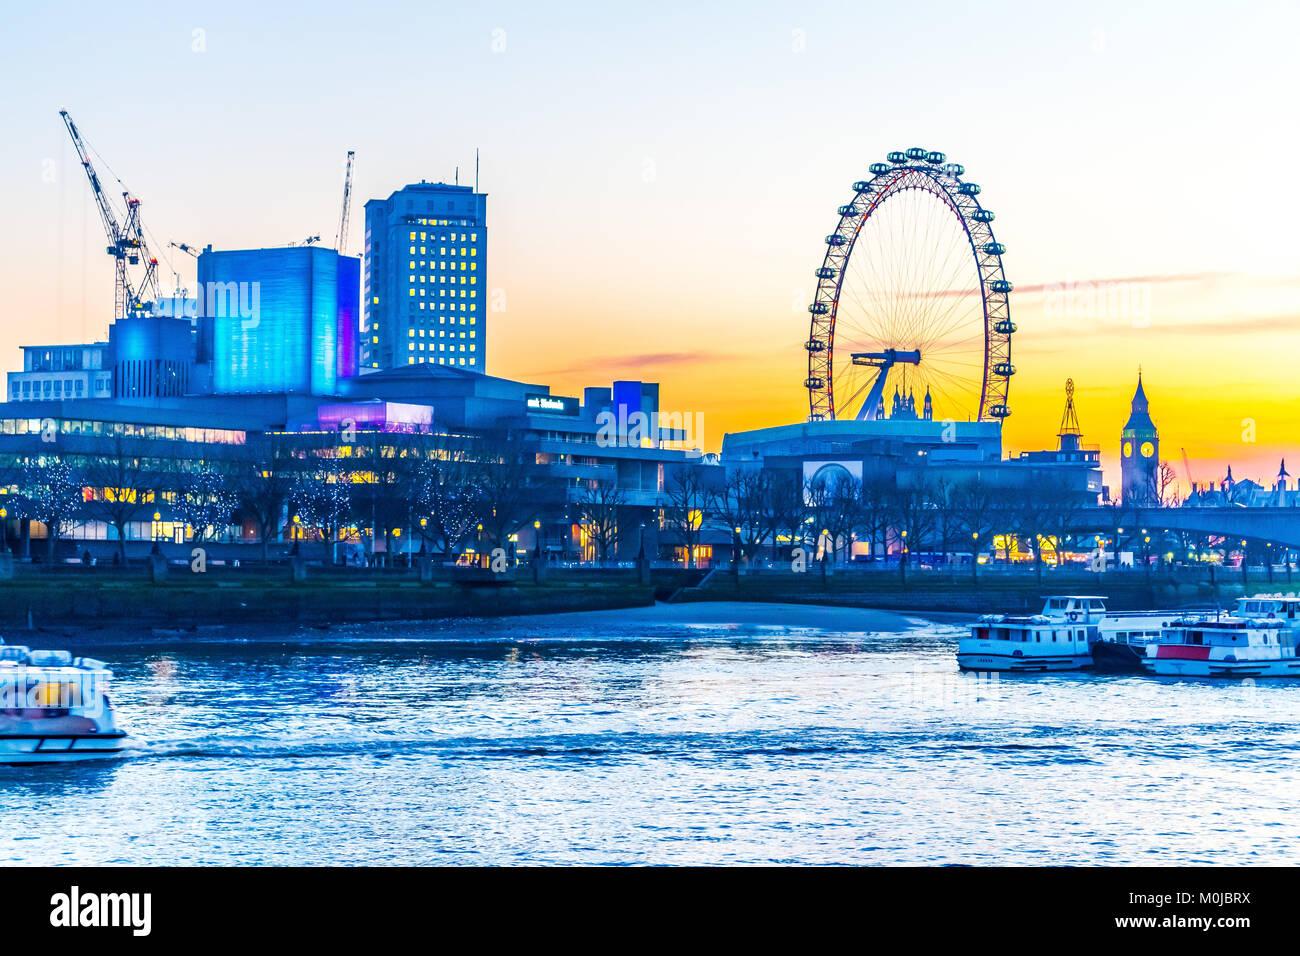 London Eye, Millennium Wheel, Embankment. - Stock Image